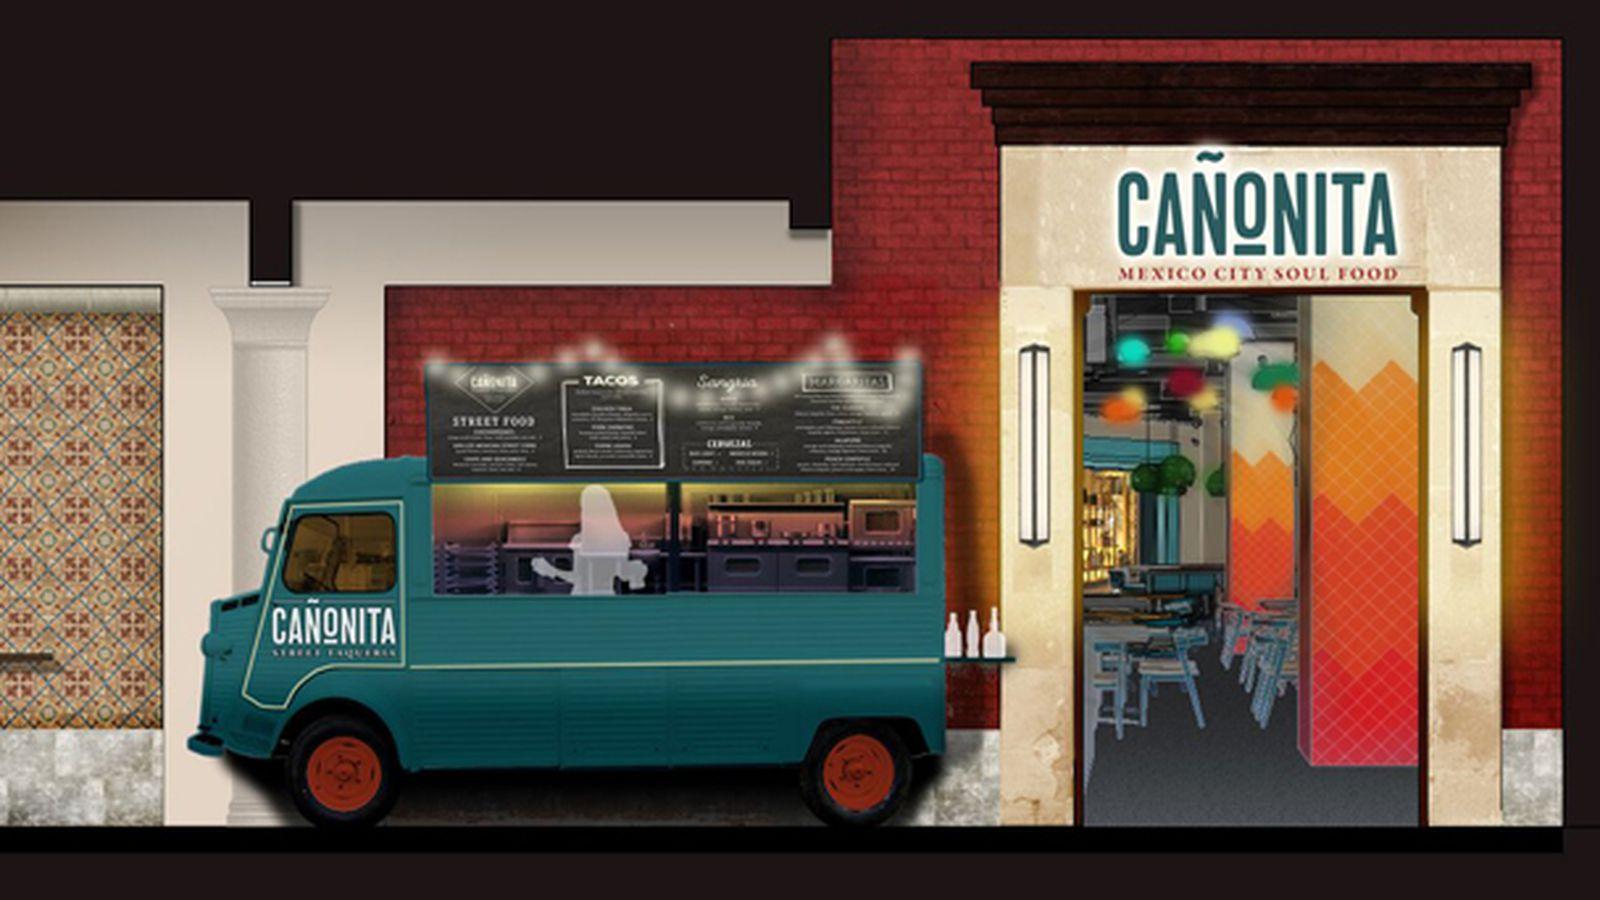 Atlanta Truck Center >> Cañonita To Temporarily Close for Renovation - Eater Vegas